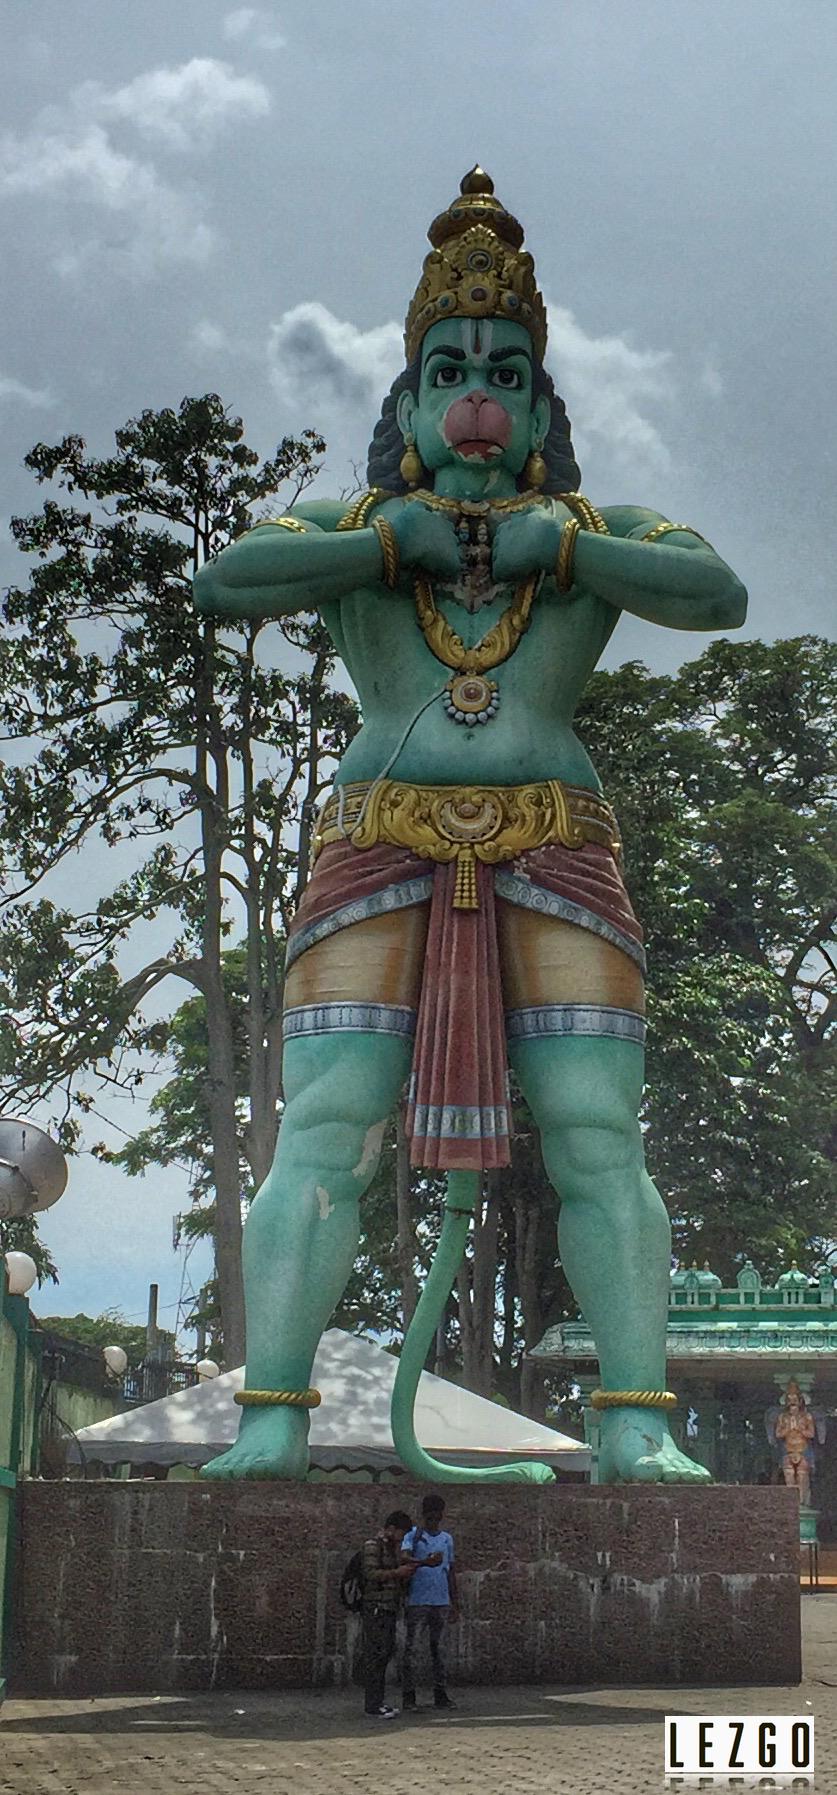 Hanuman Statue, Batu Caves, Malaysia June 2017